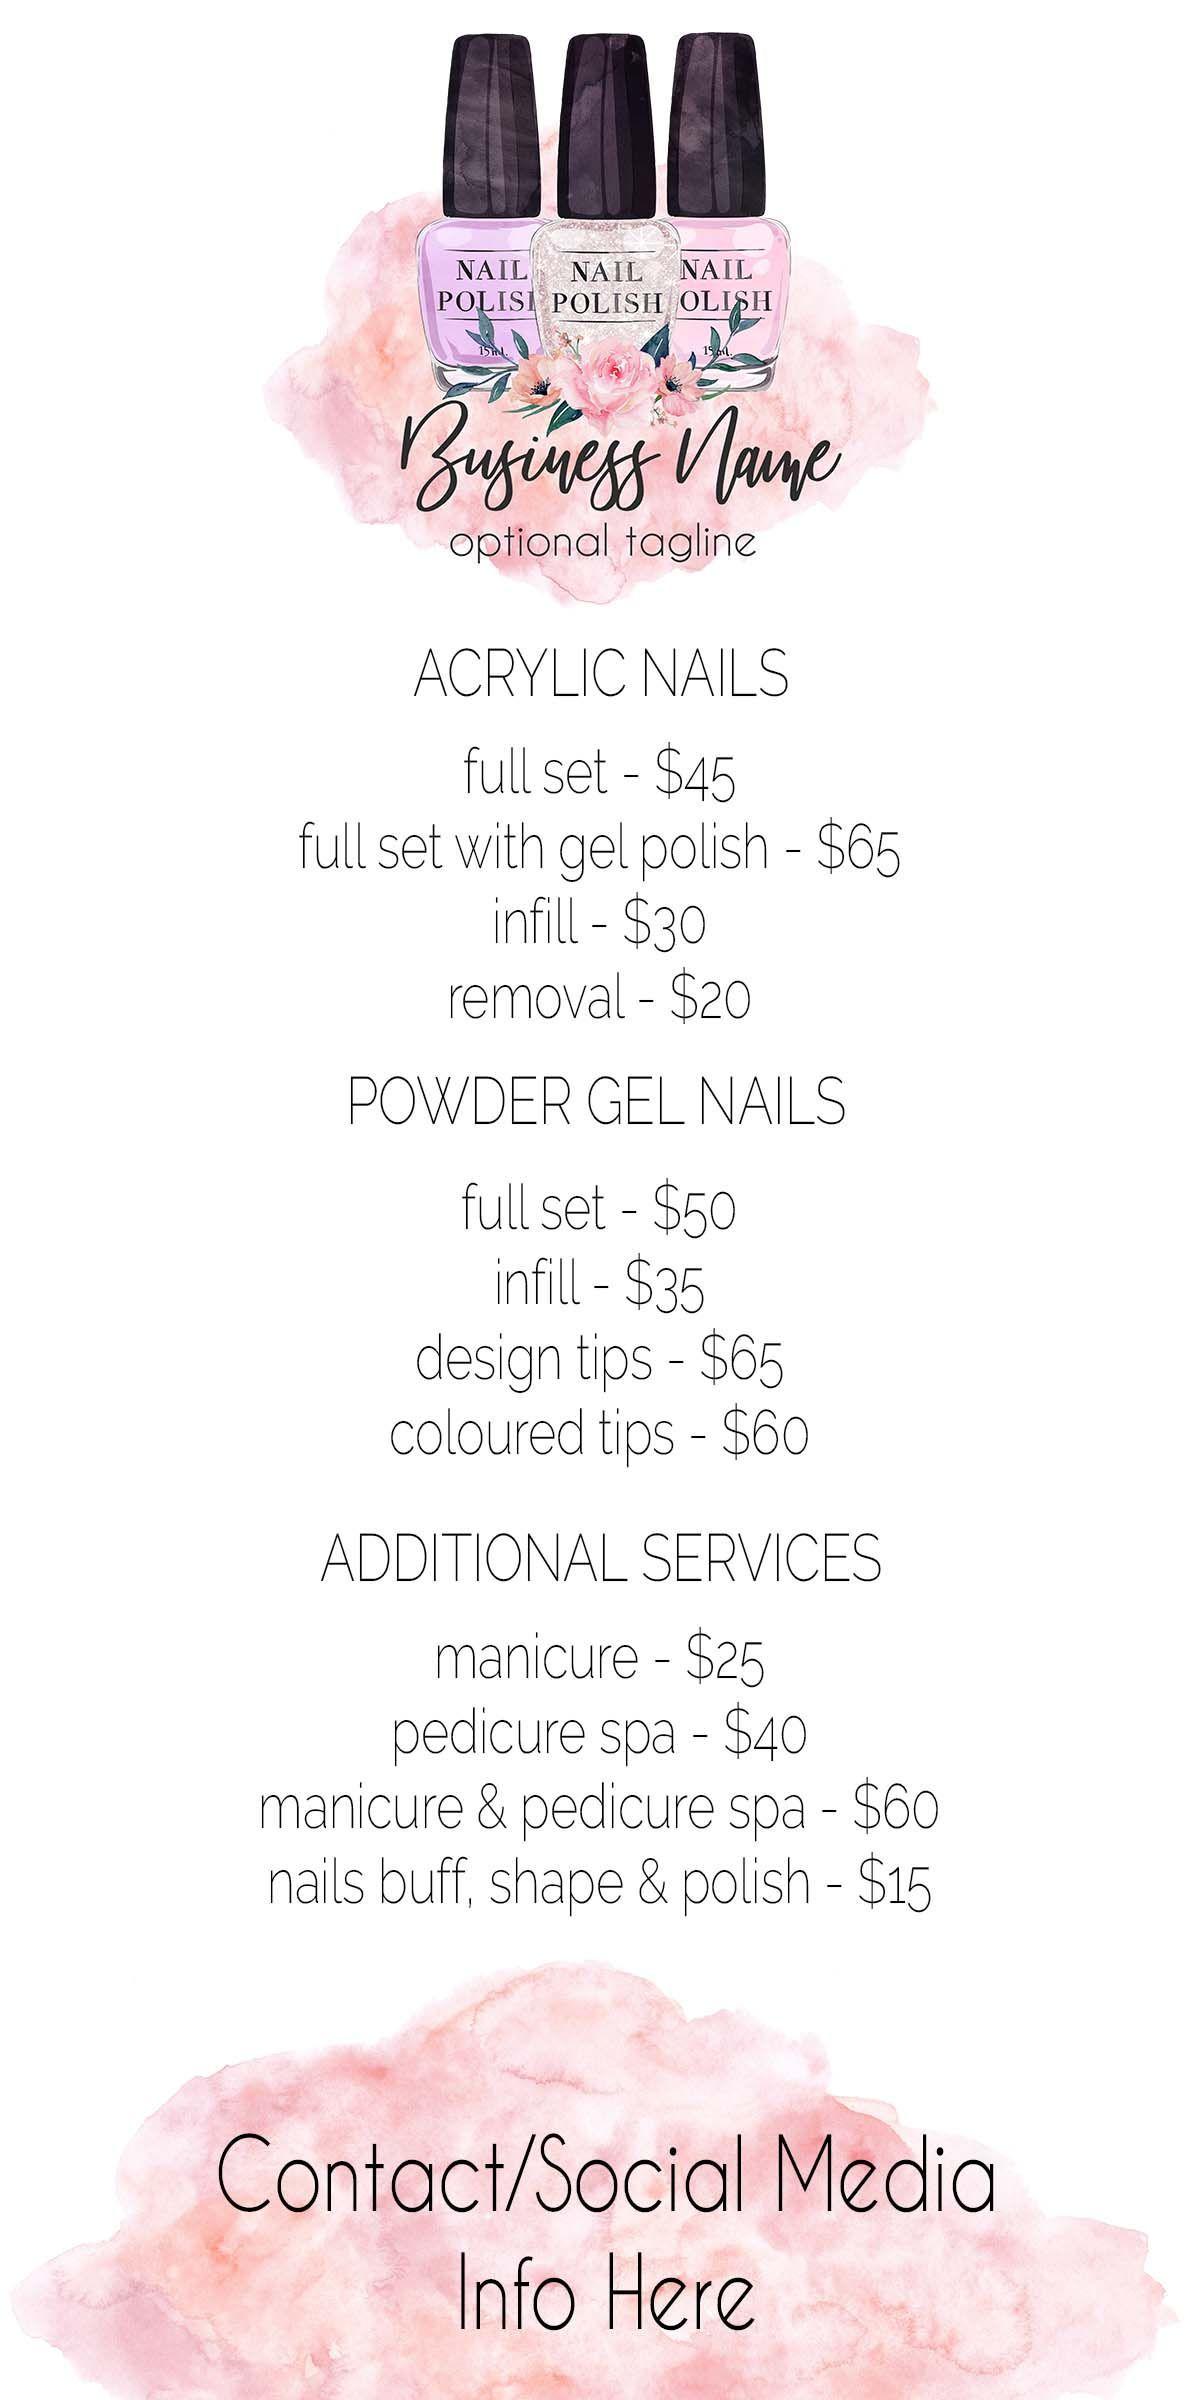 Price List Design Salon Template Price List Design Salon In 2020 Nail Salon Prices Nail Prices Home Nail Salon